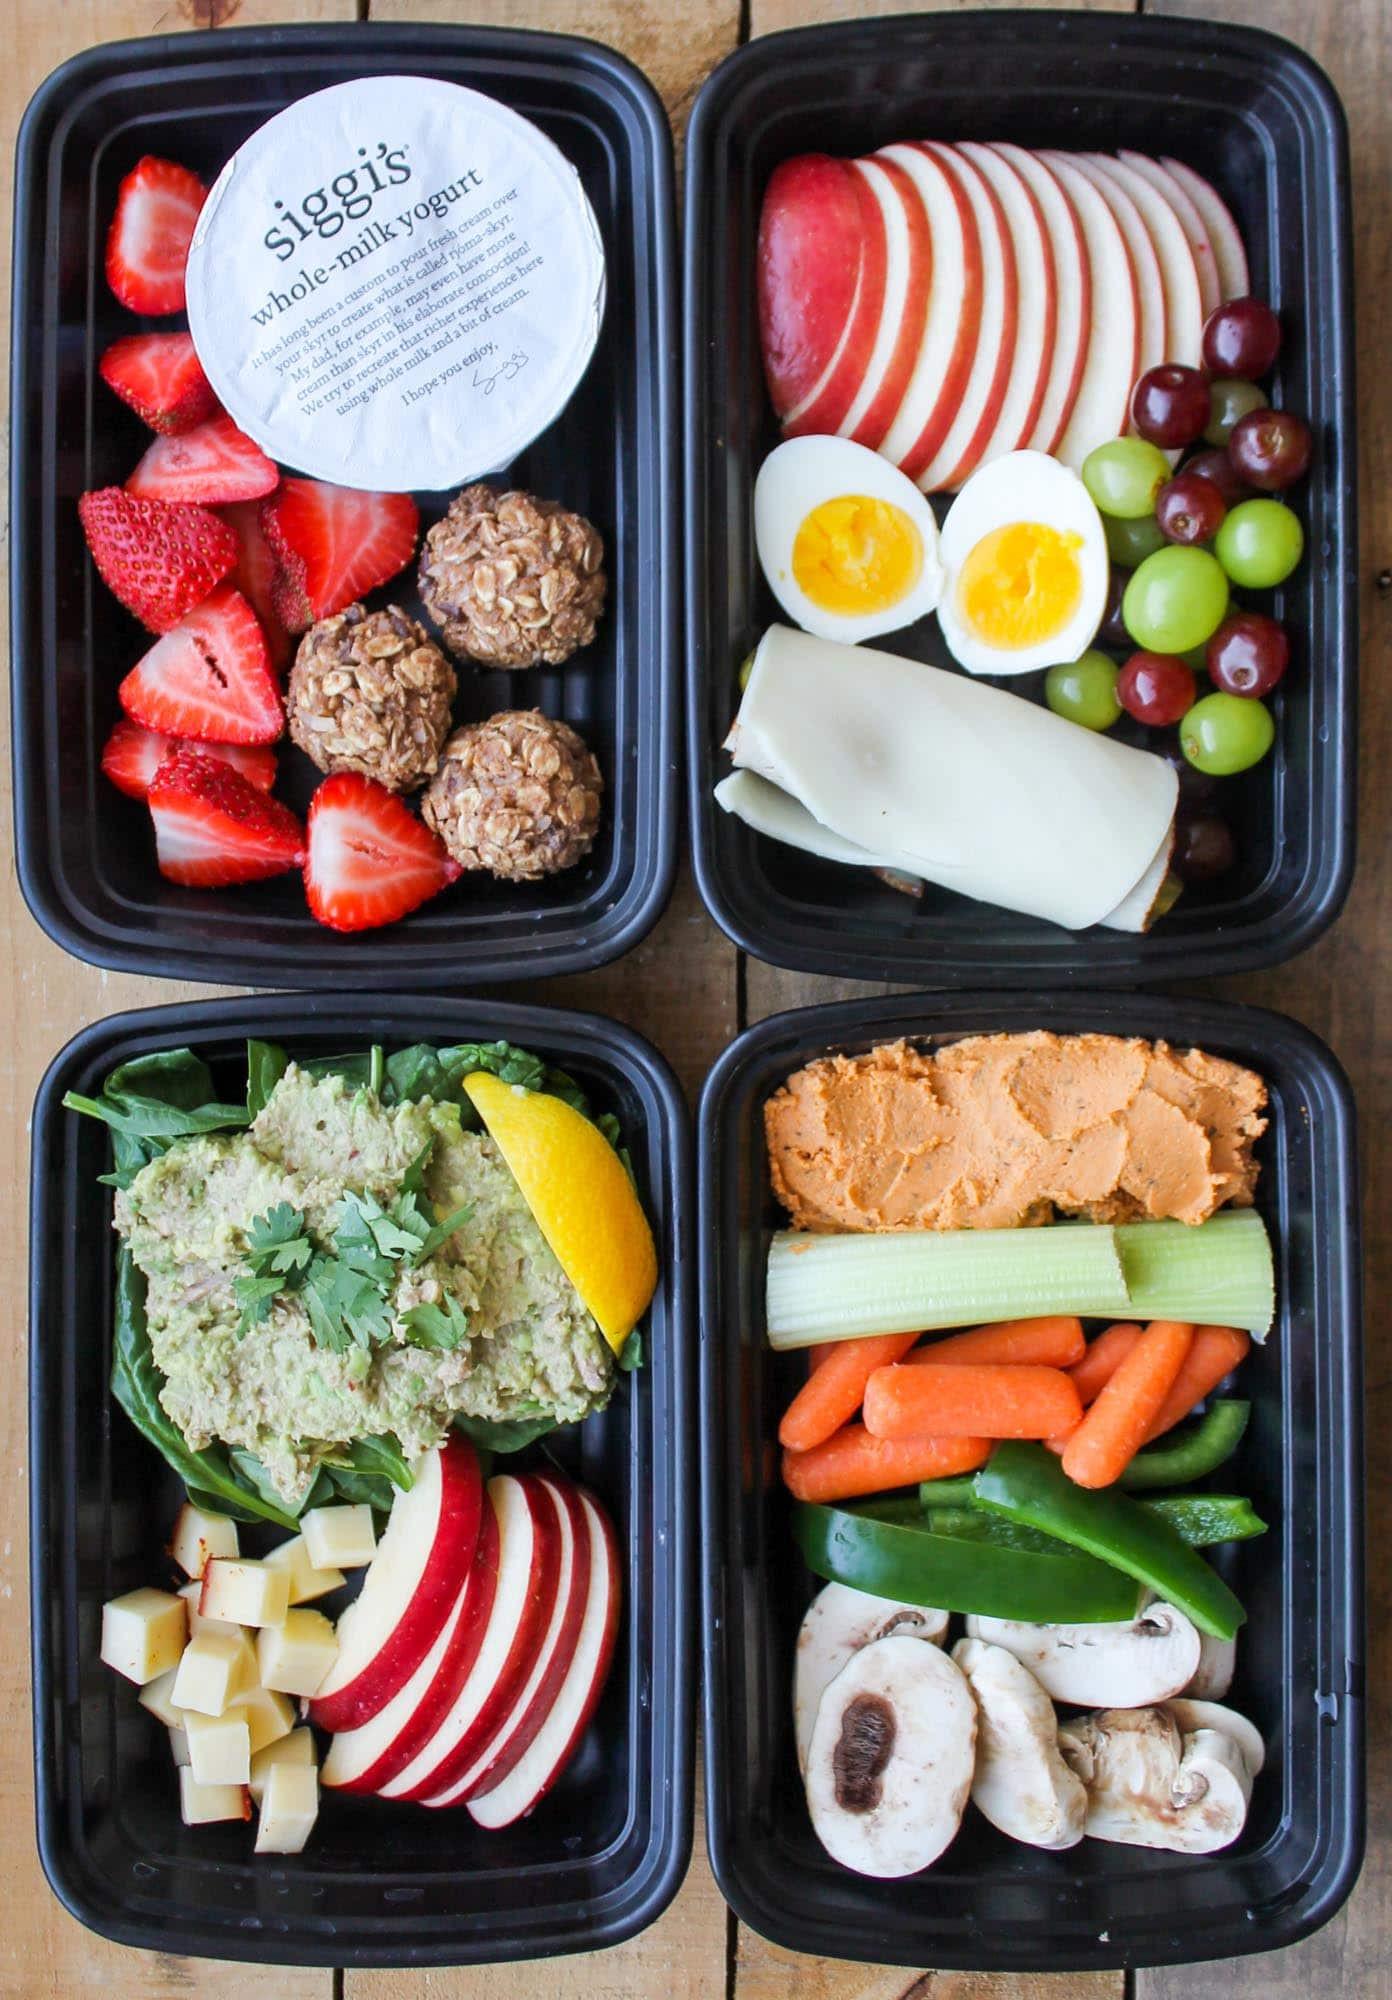 Healthy Snacks Ideas  4 Healthy Snack Box Ideas Smile Sandwich